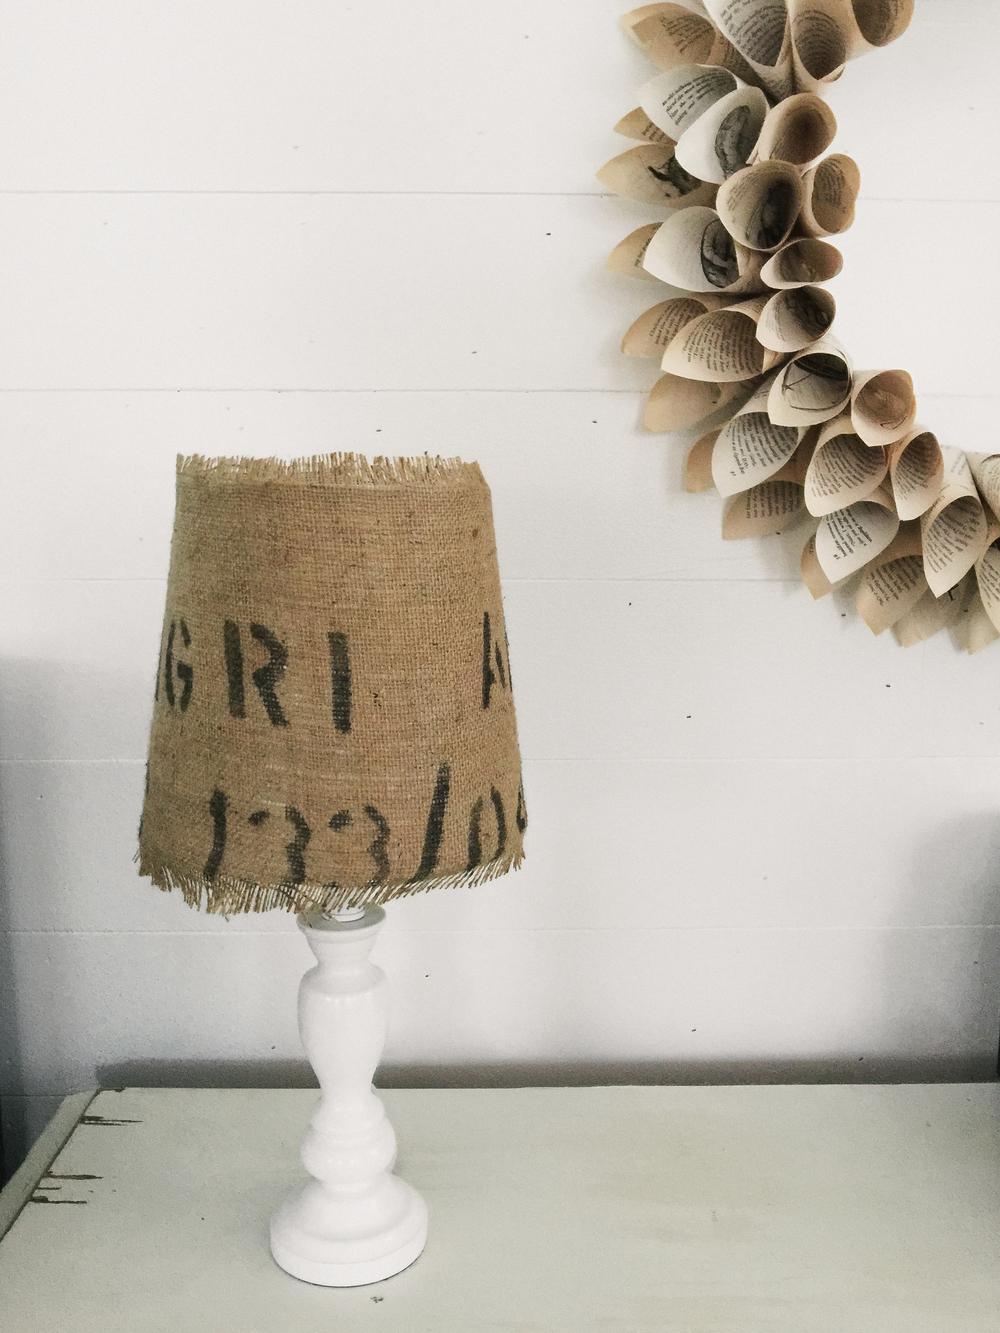 shabby chic | DIY book page wreath + burlap lamp shade